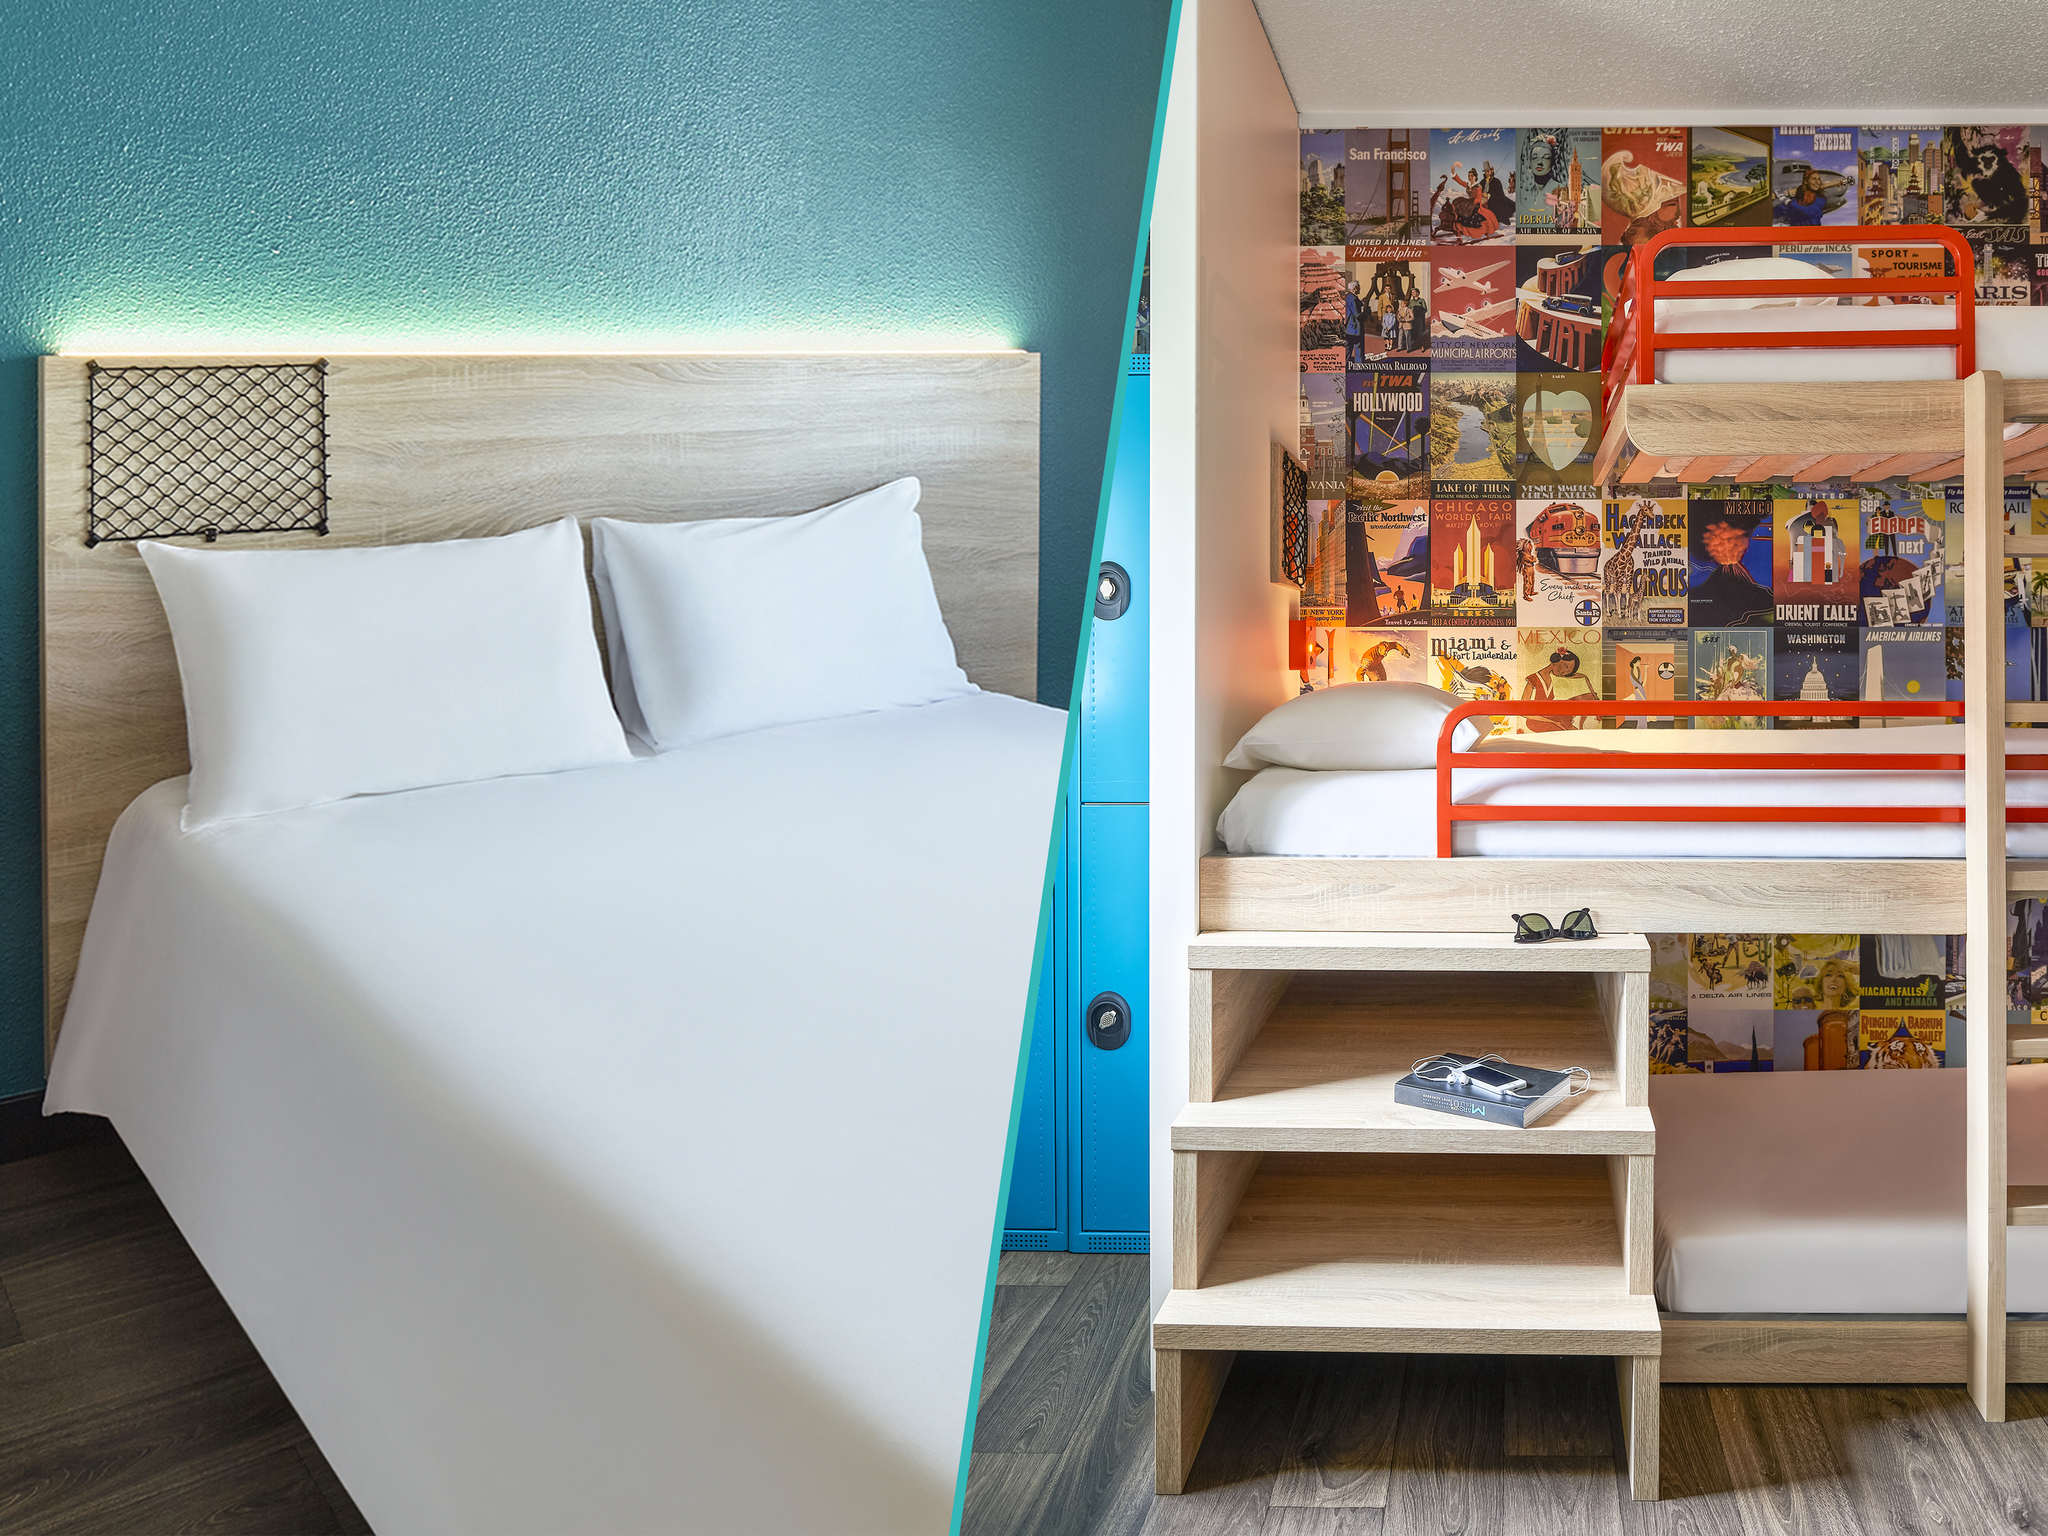 Hotel – hotelF1 Paris Porte de Châtillon